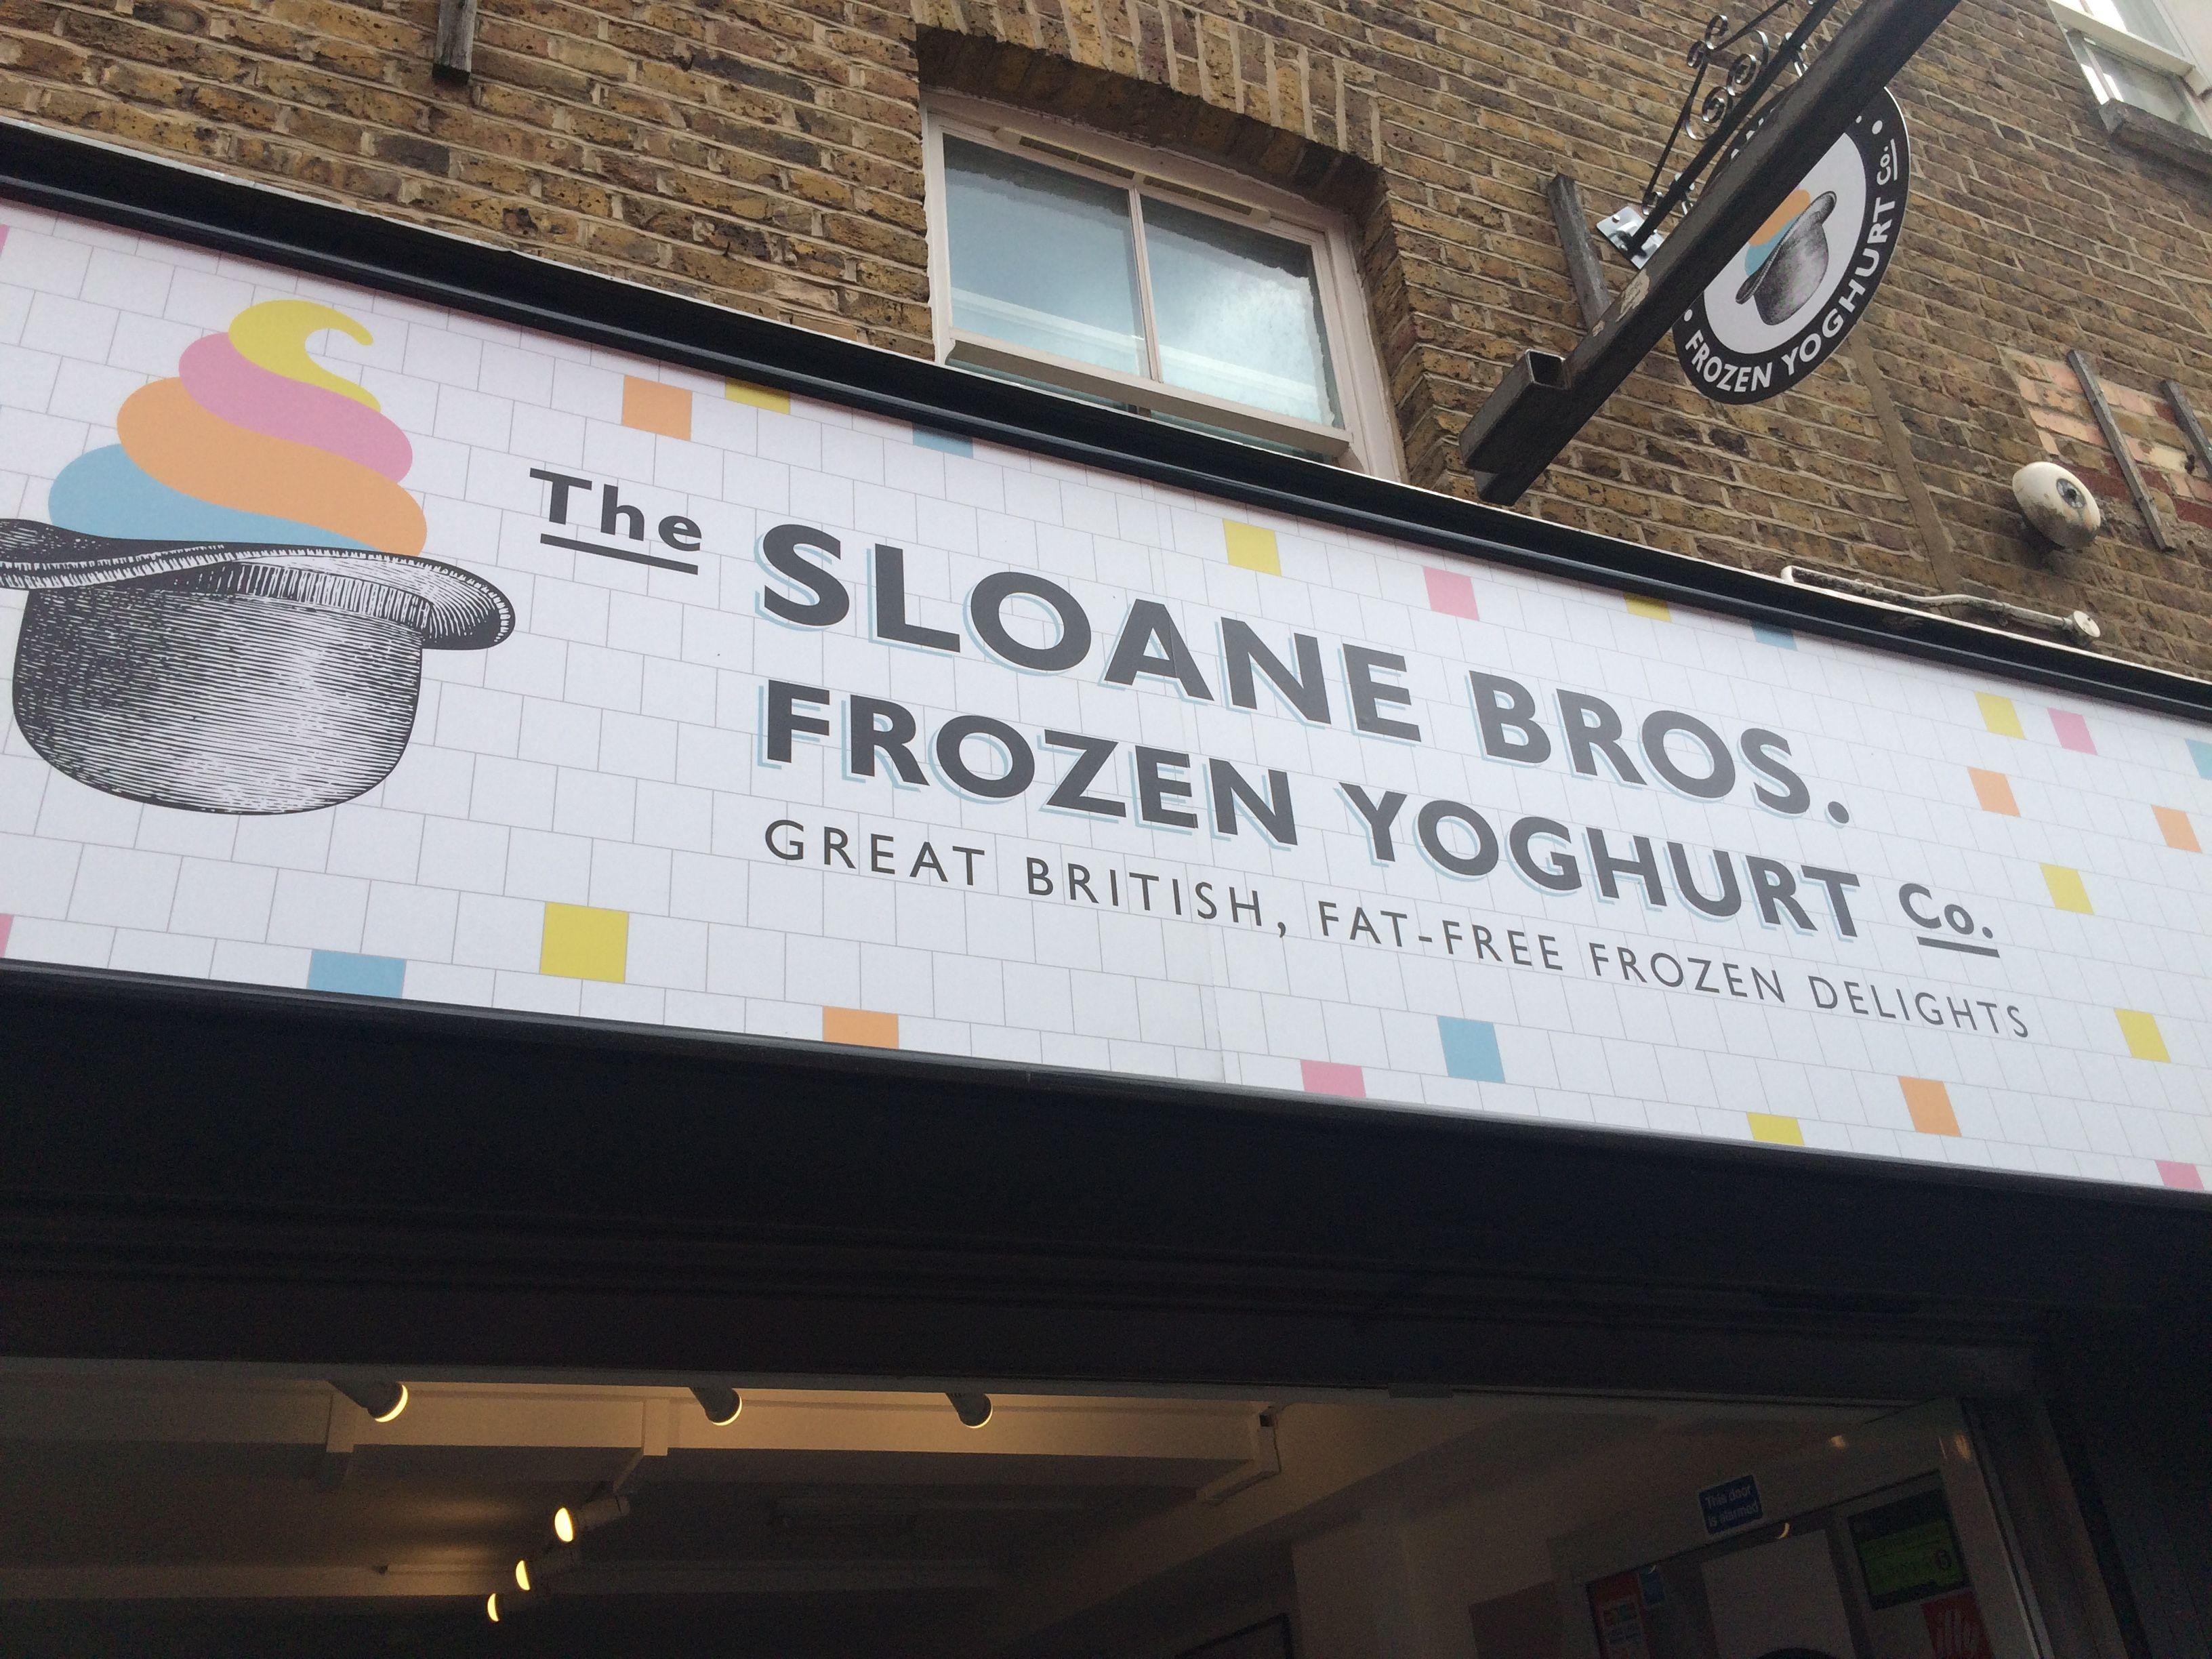 Sloane Bros Frozen Yoghurt